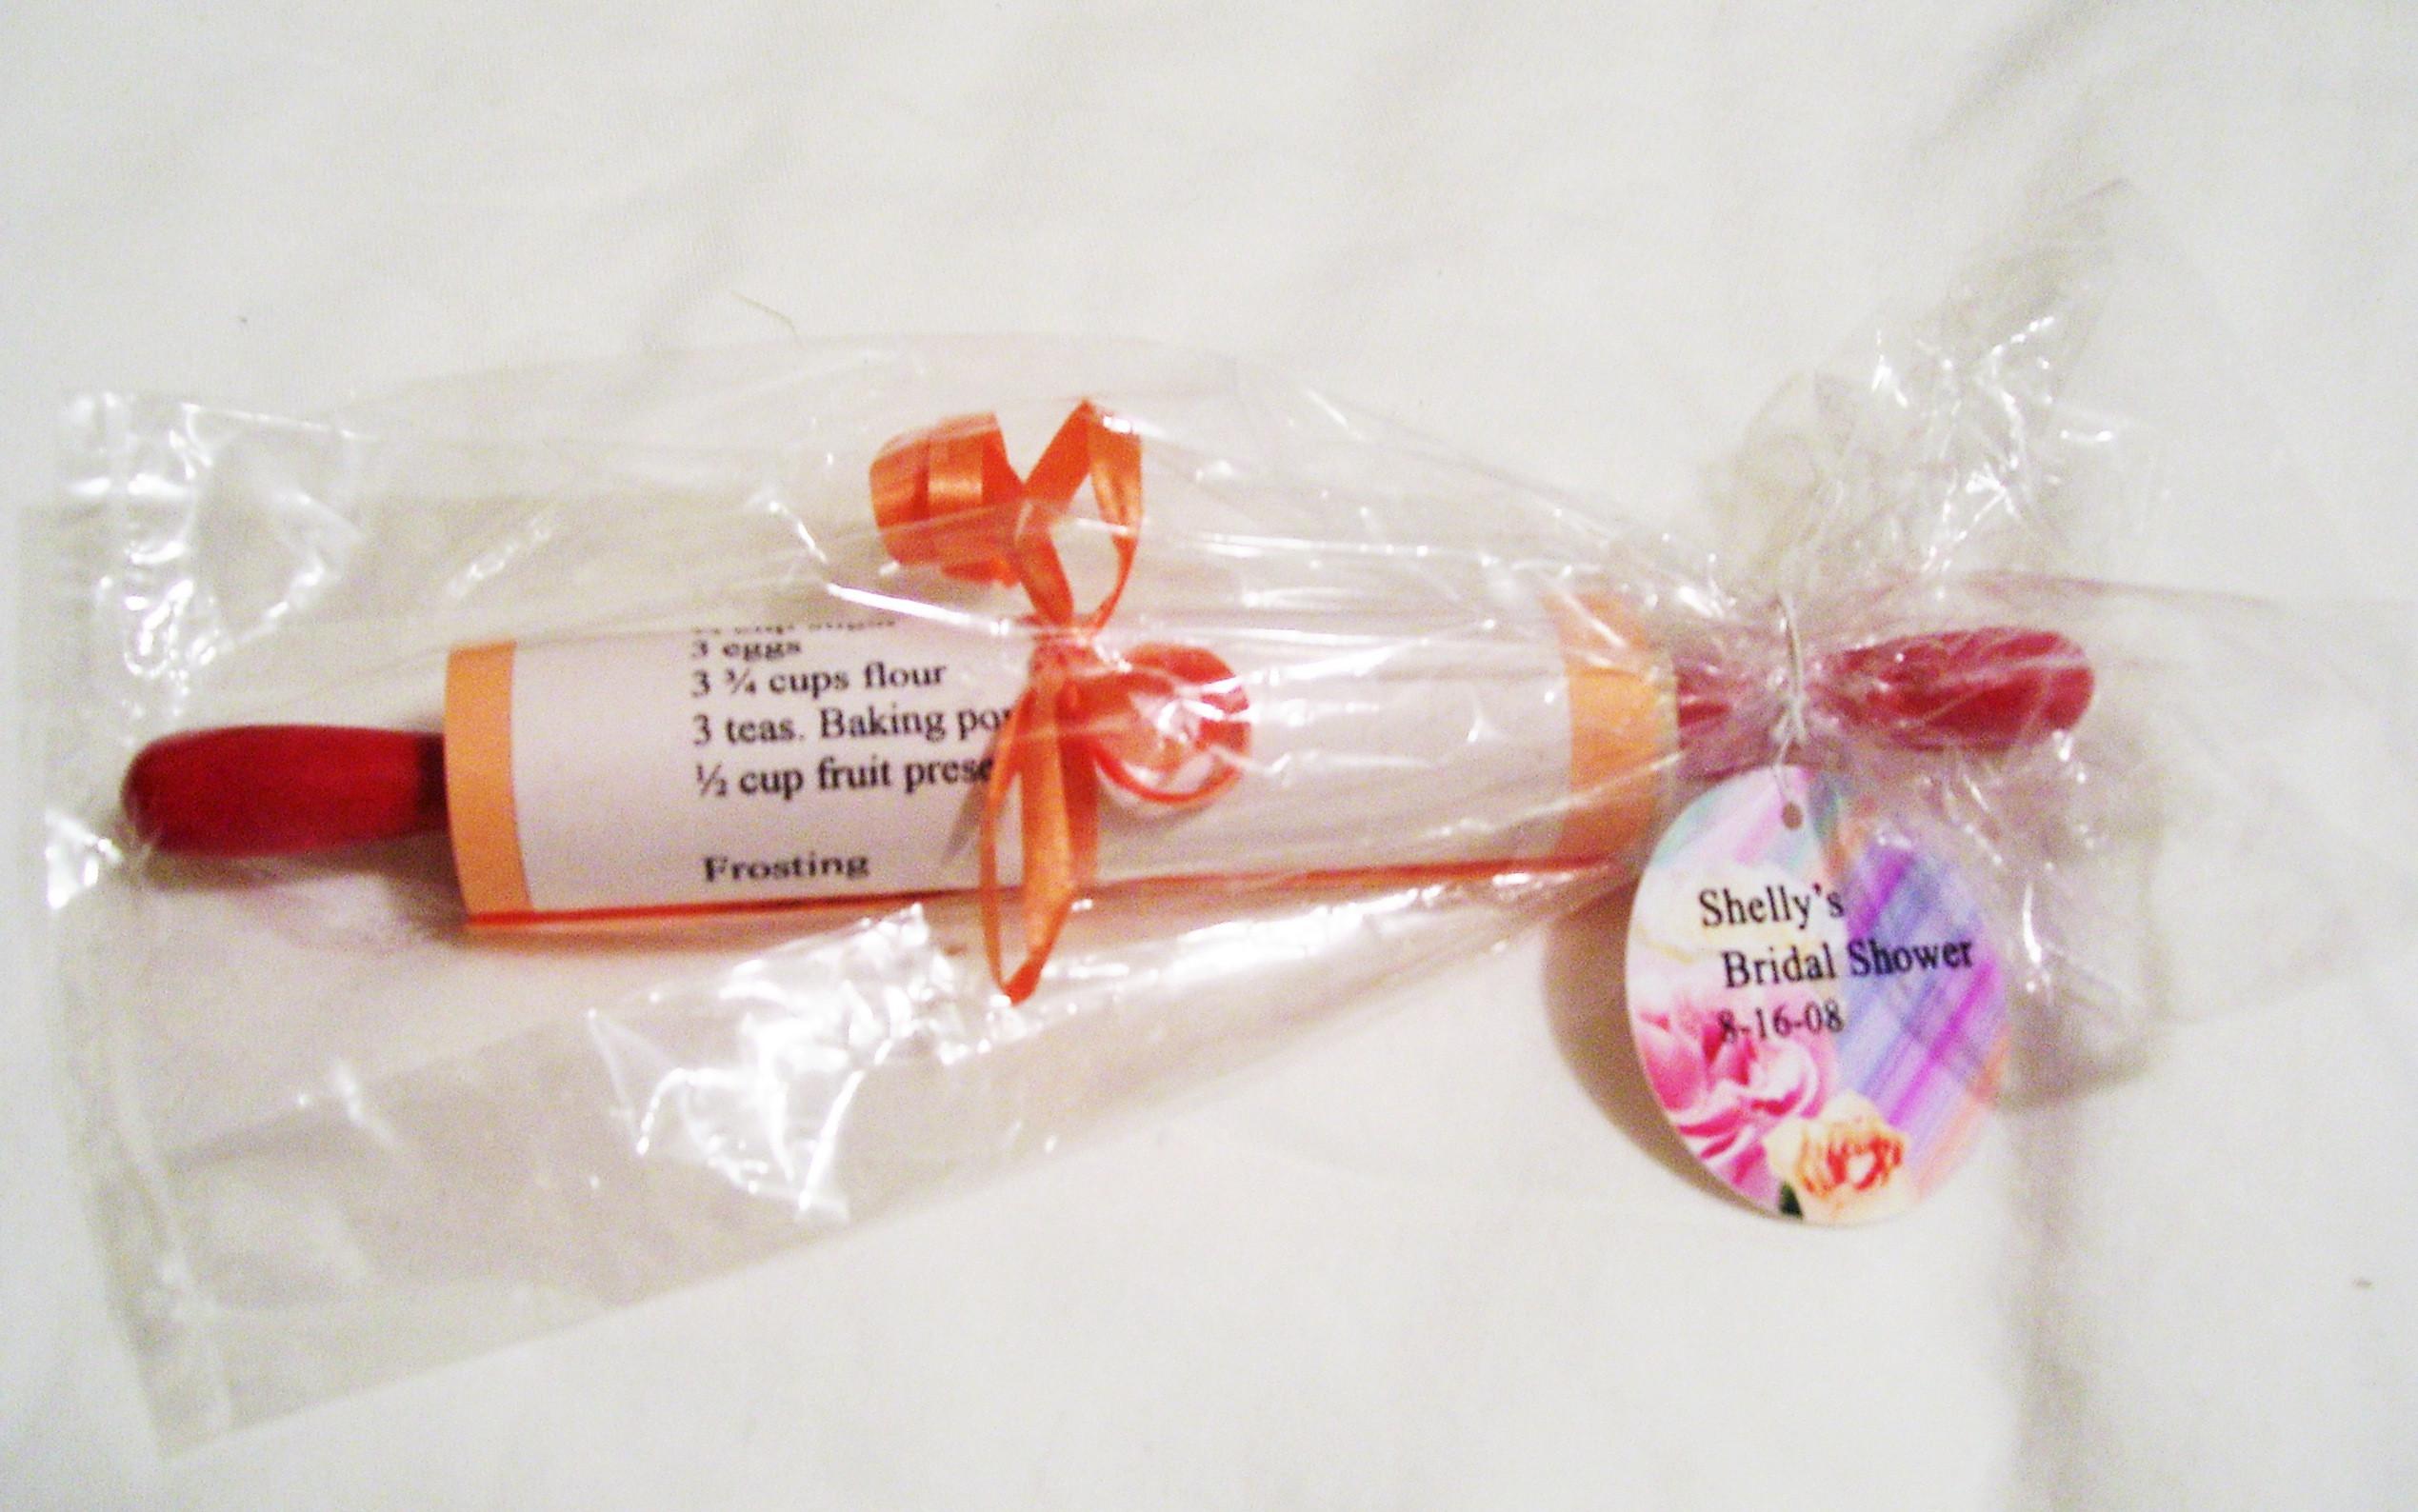 Best ideas about Wedding Favor Gift Ideas . Save or Pin Wedding World Wedding Favor Gift Ideas Now.